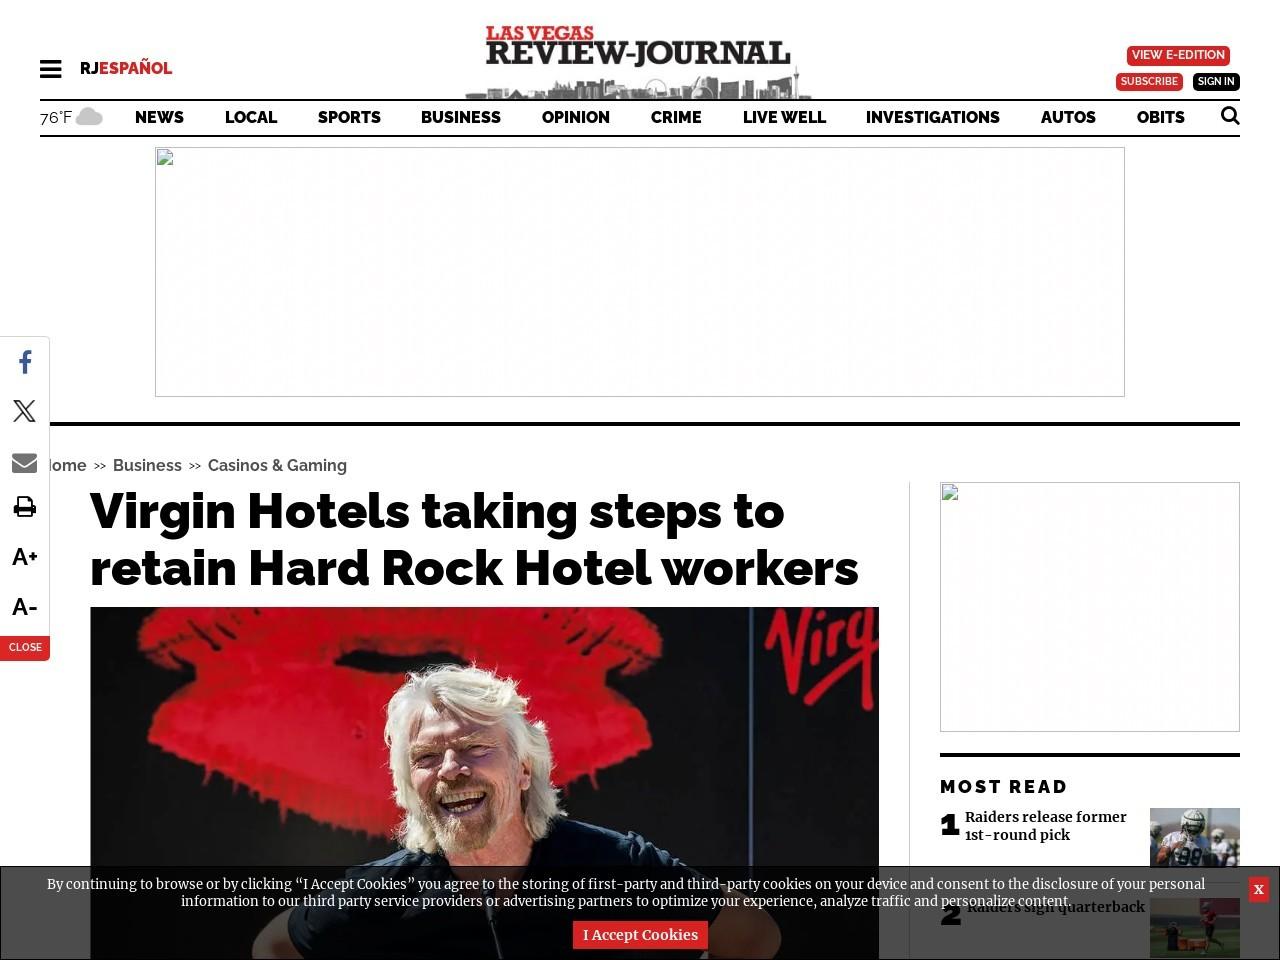 Virgin Hotels taking steps to retain Hard Rock Hotel workers